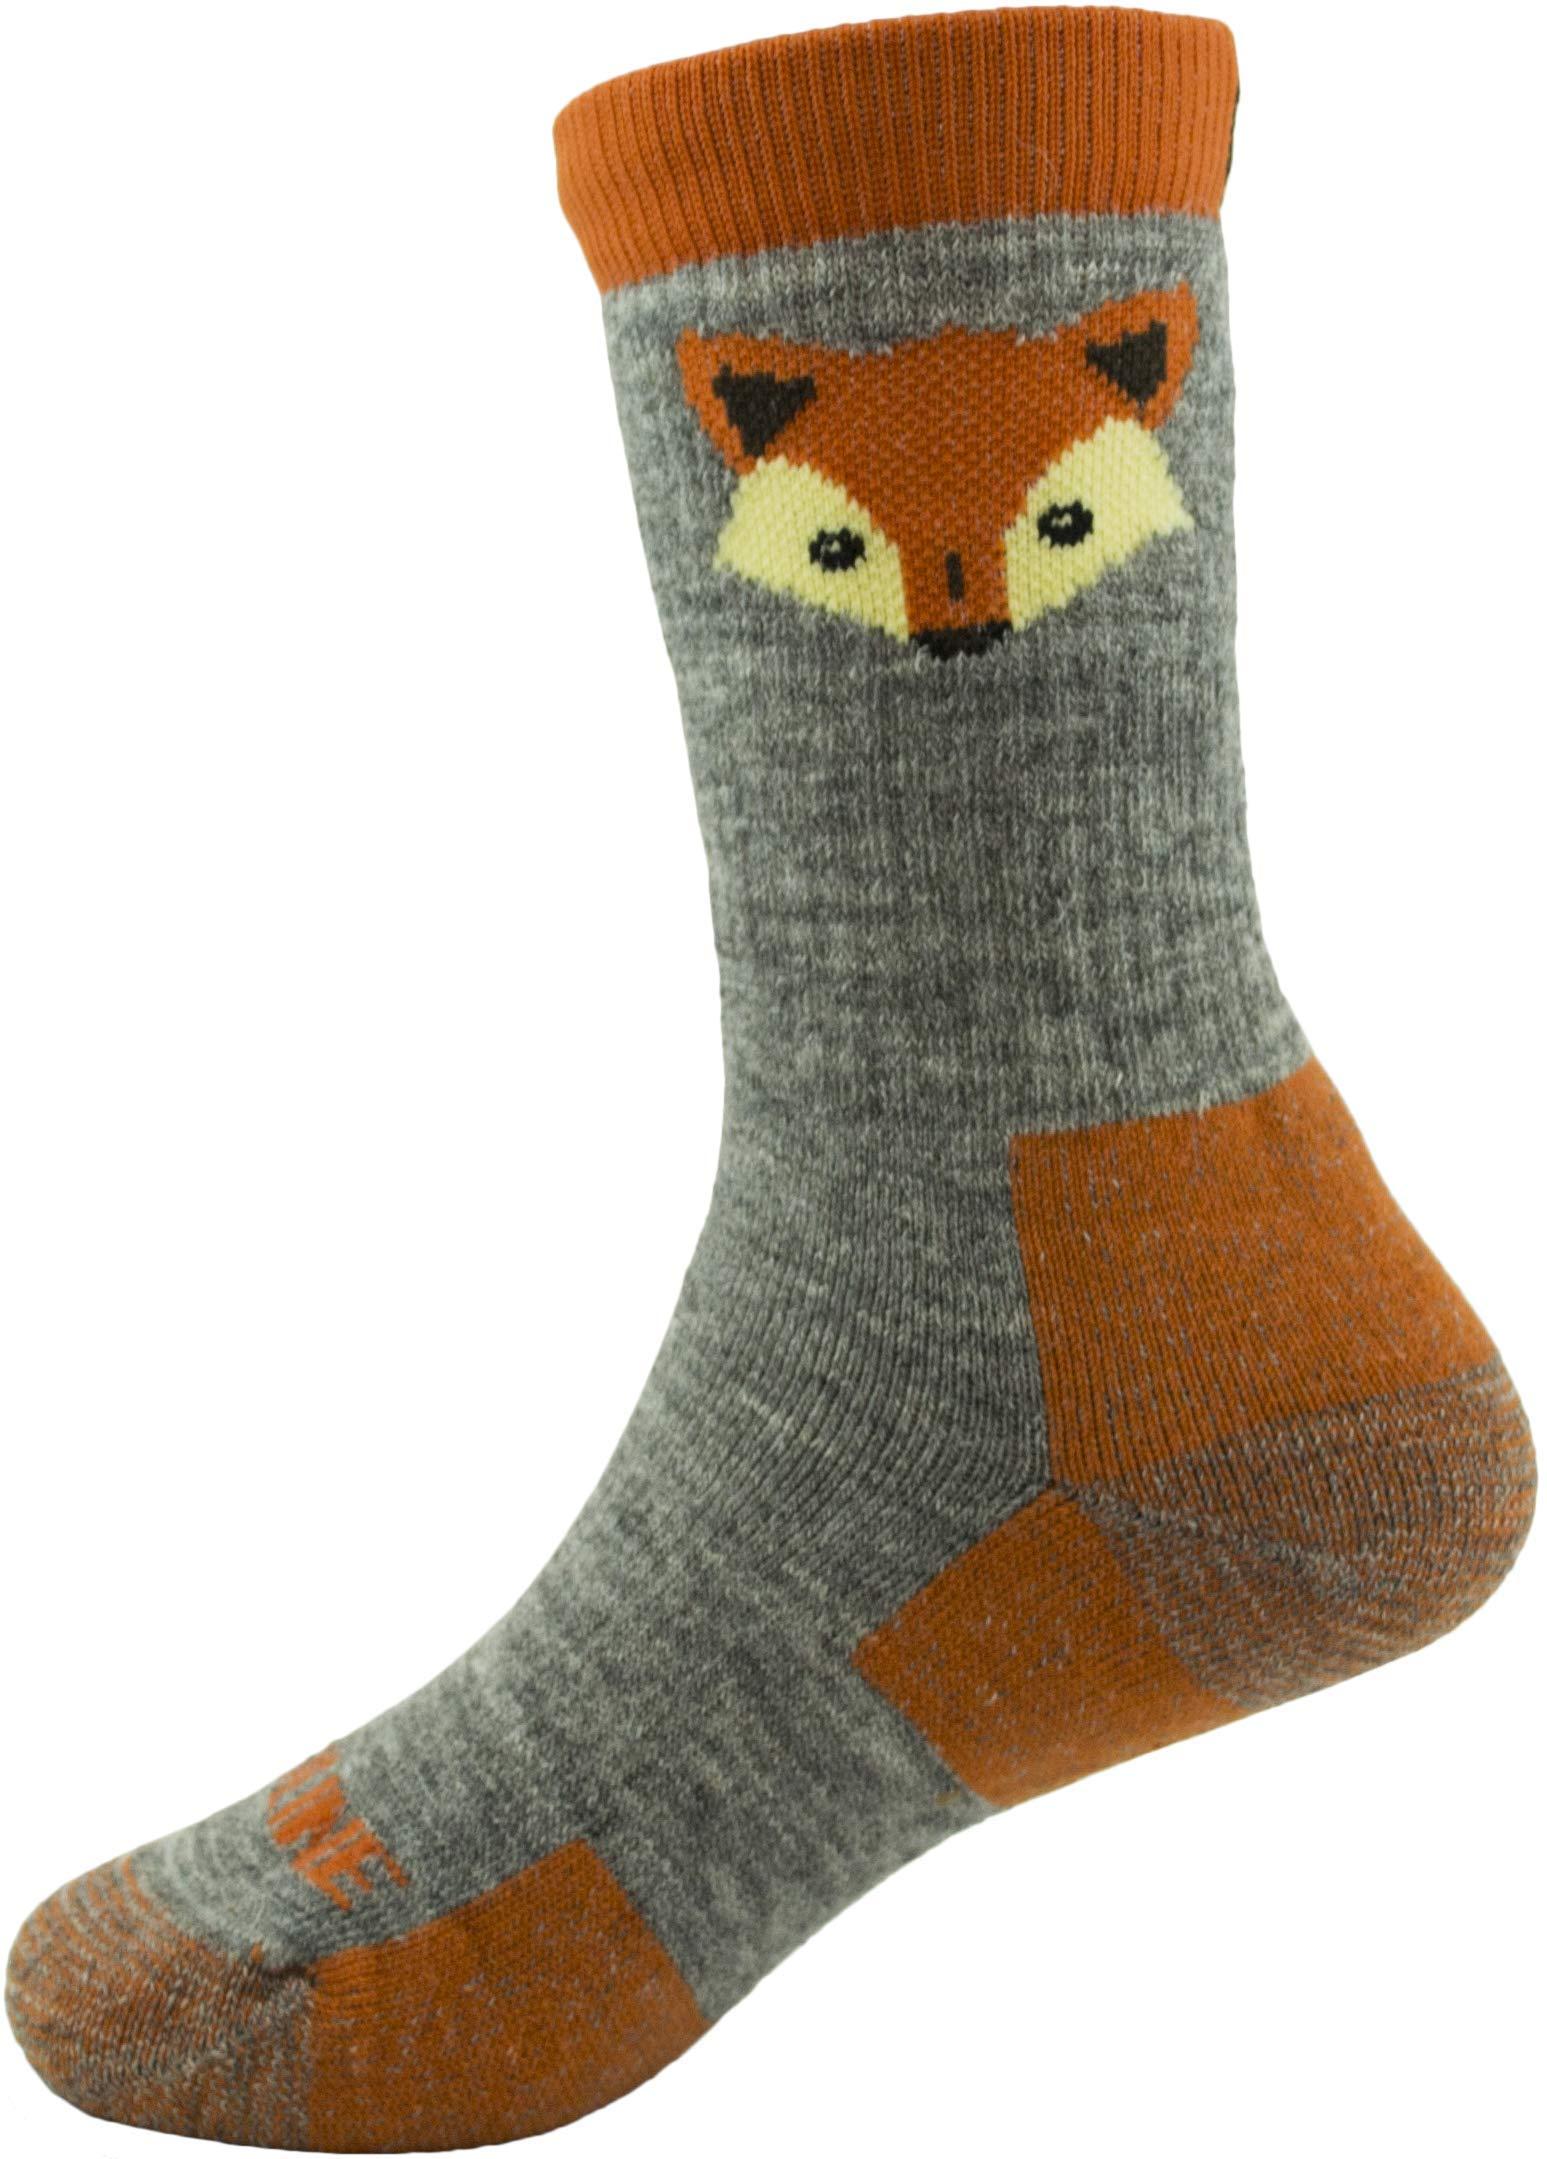 CloudLine Merino Wool Kid's Spirit Animal Socks - 2 Pack - Orange Fox - Size Y-XS - Made in USA